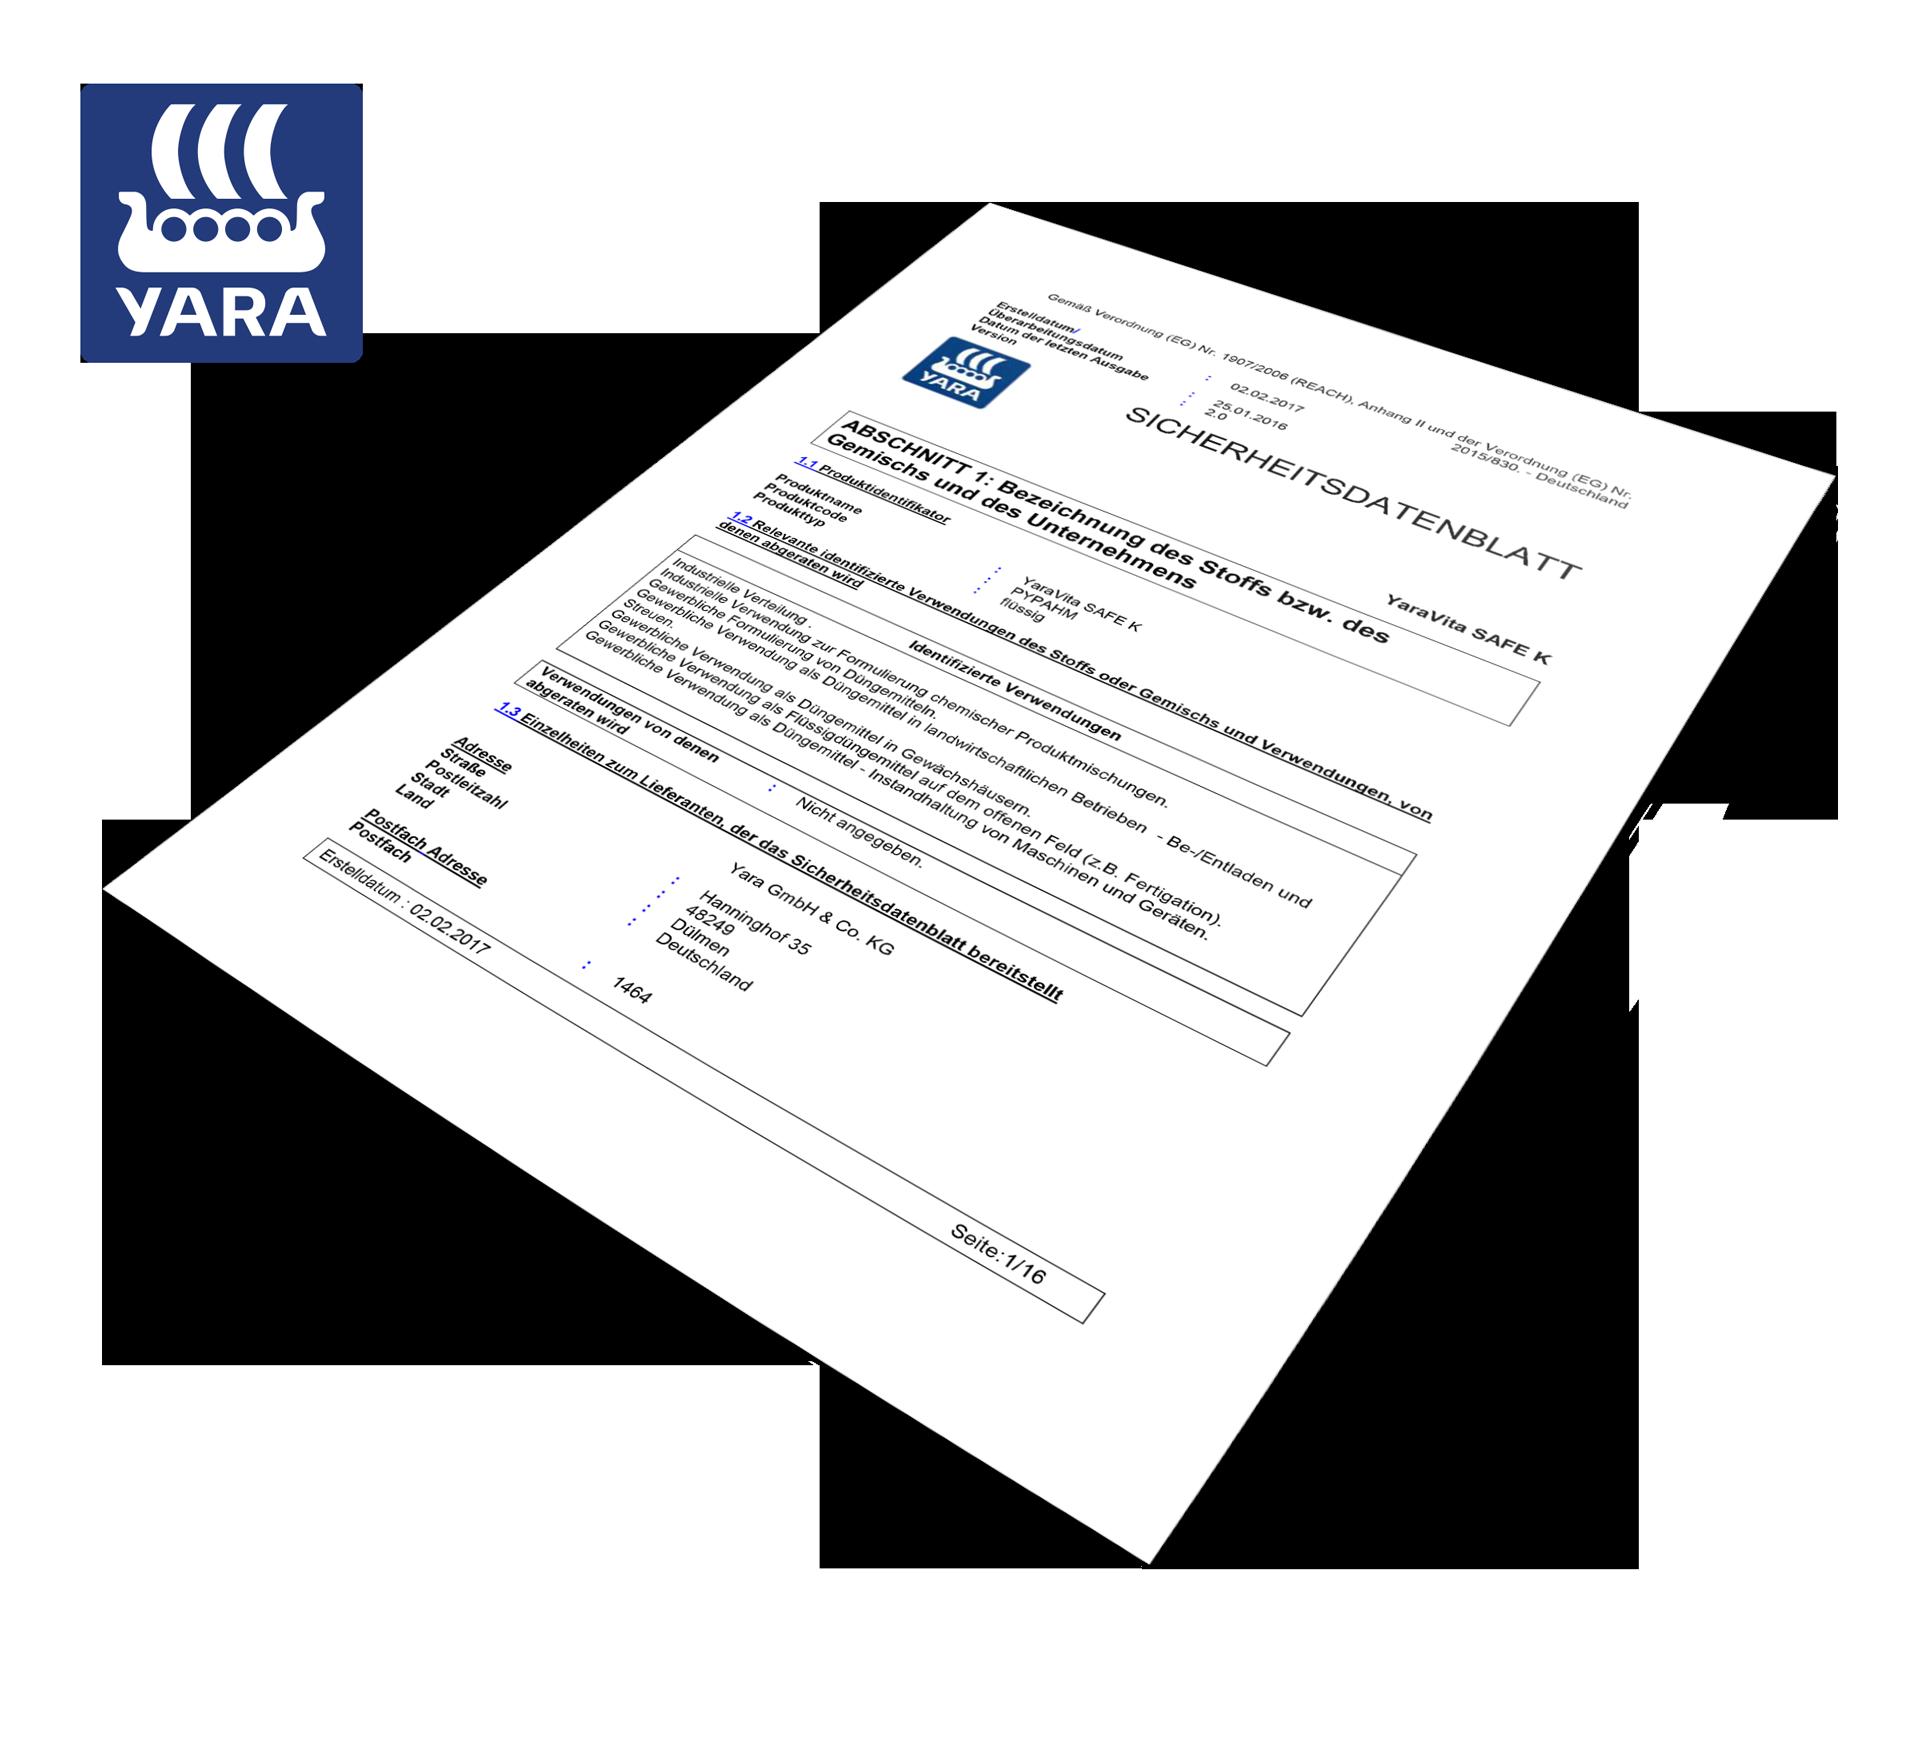 Yara_Vita_Safe-K_Sicherheitsdatenblatt